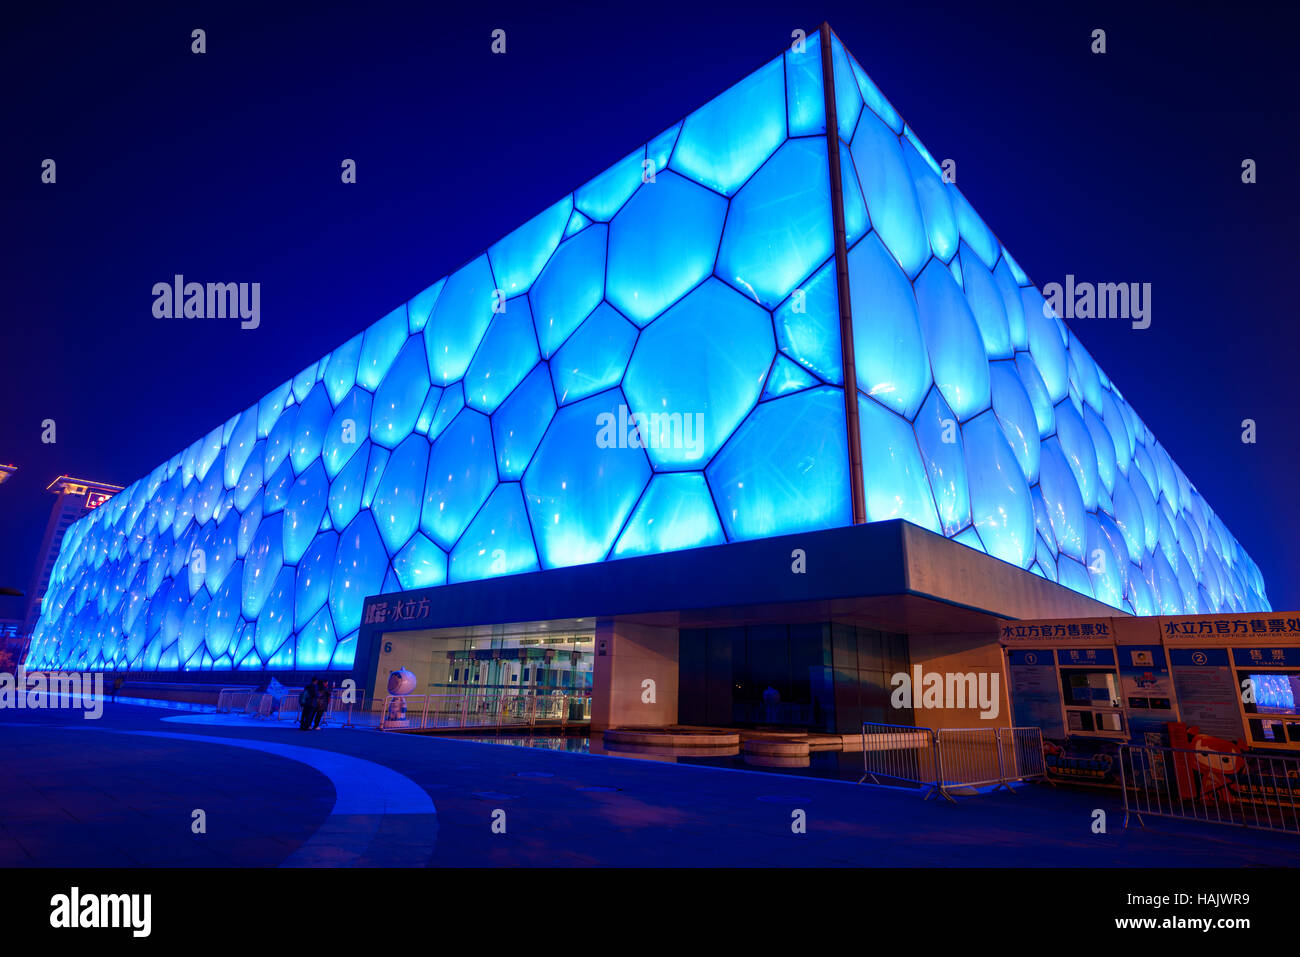 Cubo de agua - un gran angular de vista nocturna de Beijing National Aquatics Center, también conocido como cubo Foto de stock